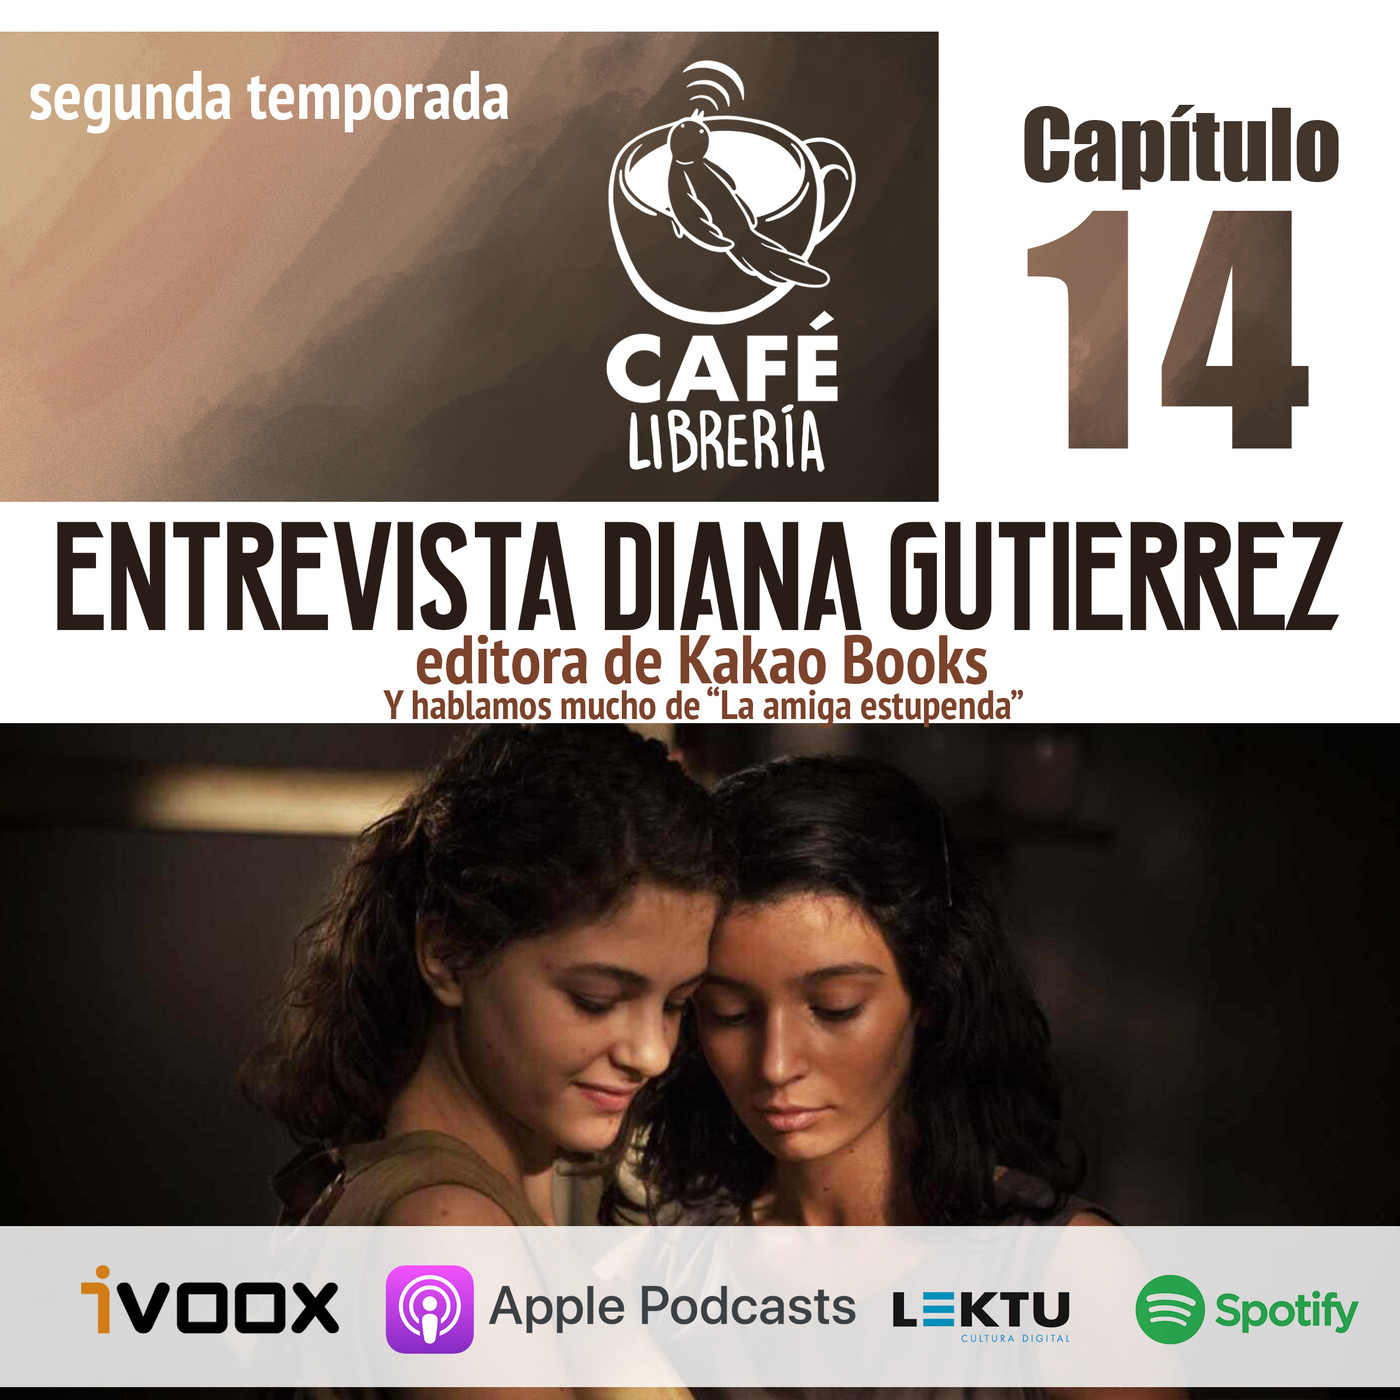 Temporada 2, capítulo 14: Entrevista Diana Gutiérrez (Kakao Books)